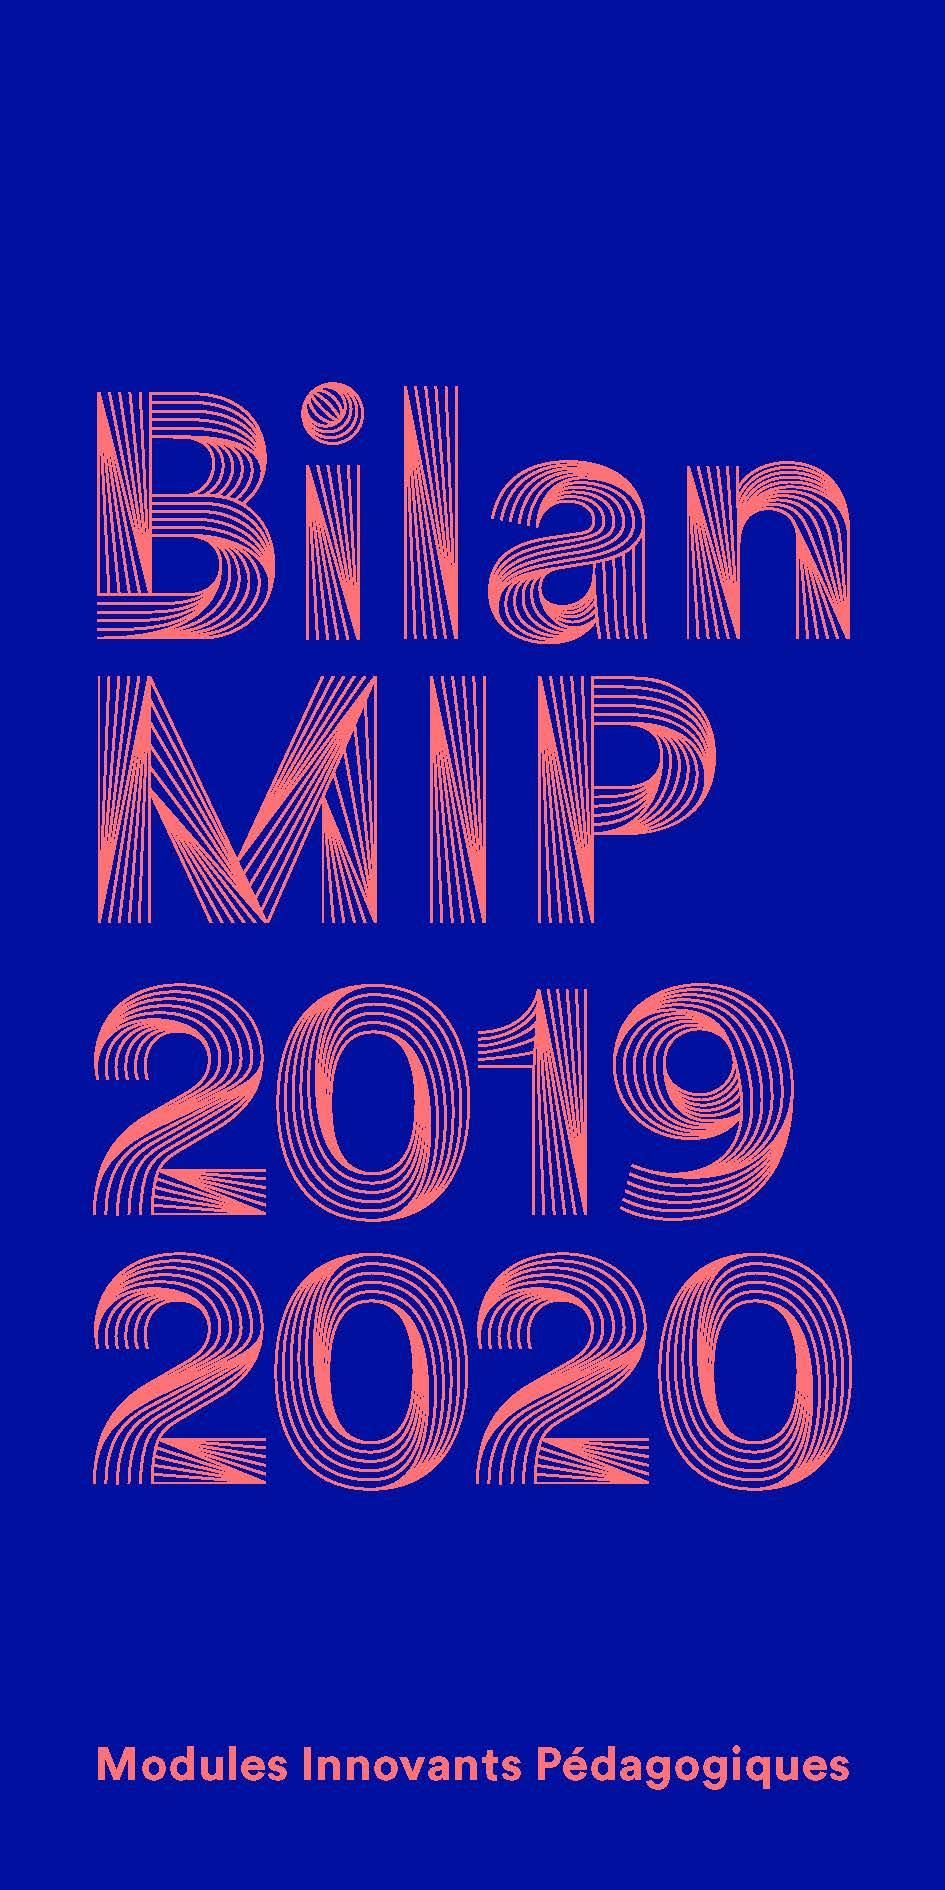 Bilan des modules innovants pédagogiques 2019-2020